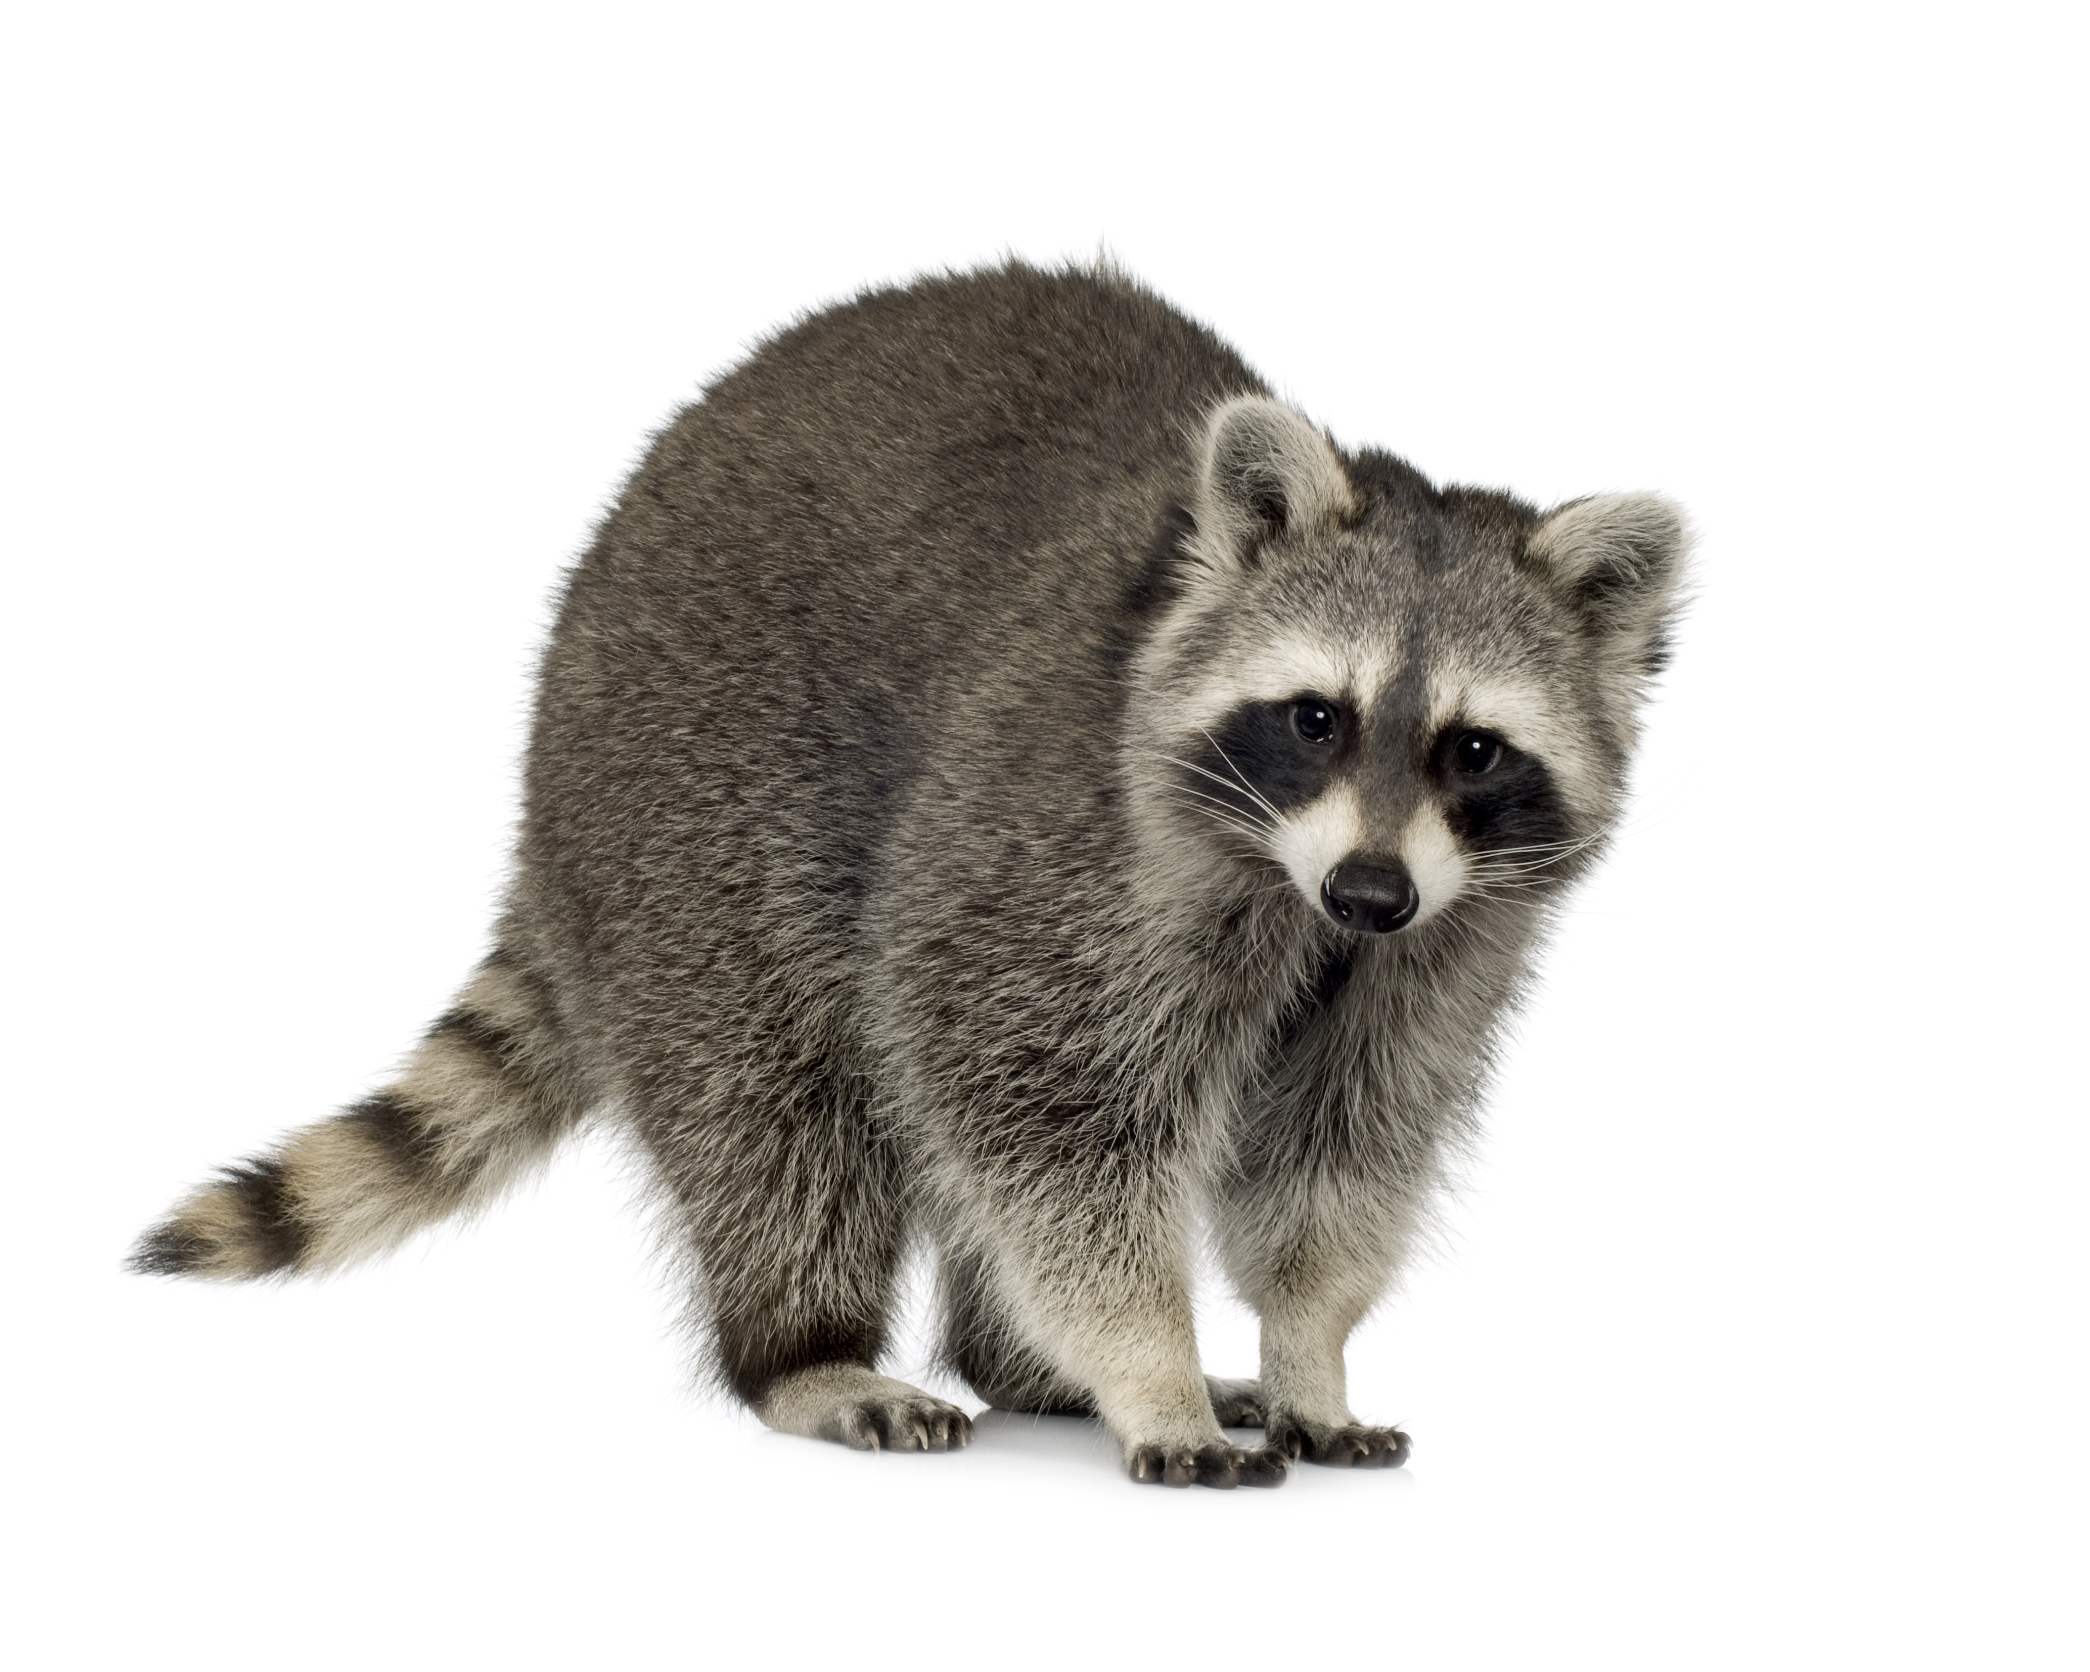 Raccoon.JPG (JPEG Image, 2090x1672 pixels)